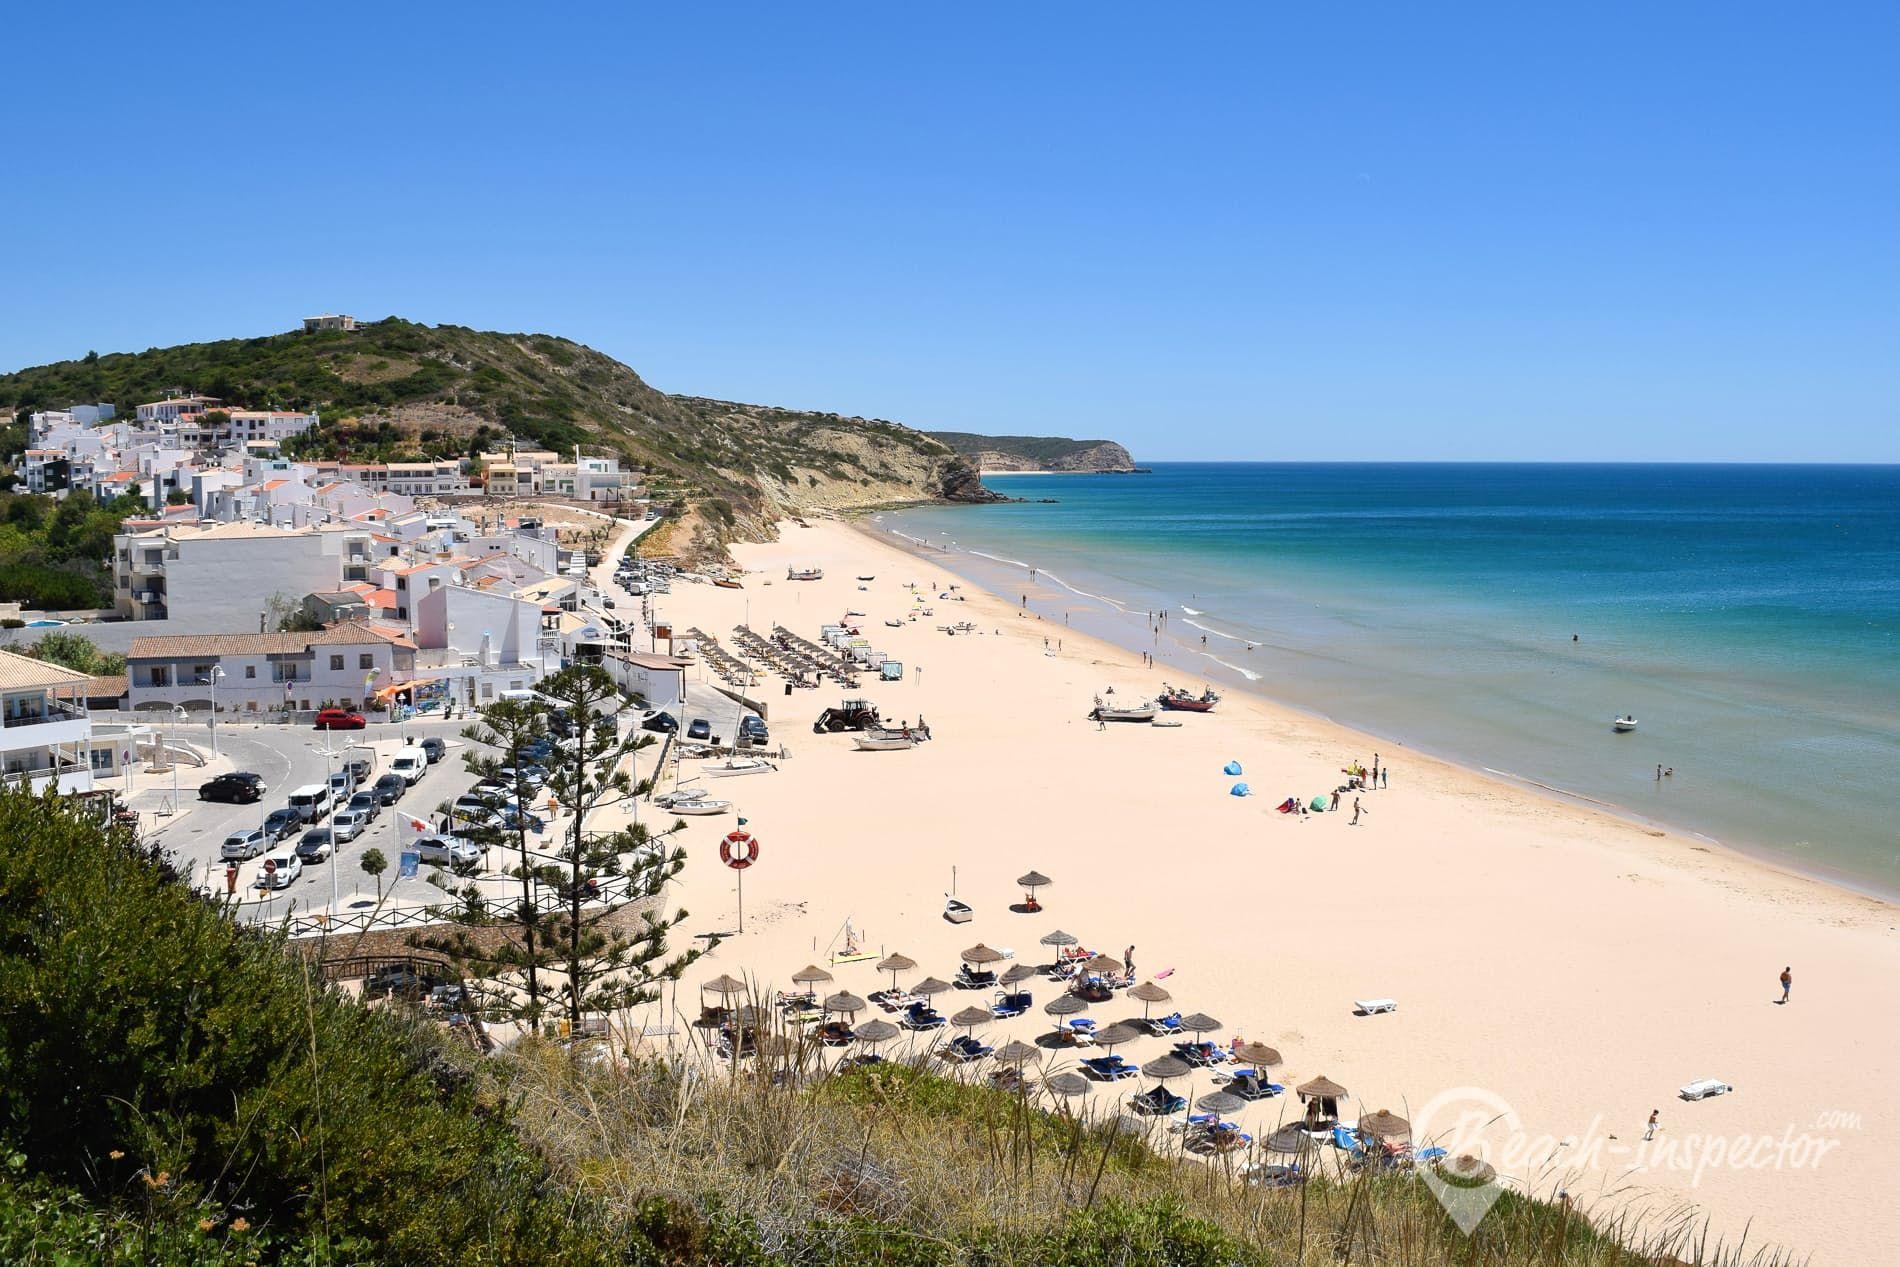 Strand Praia da Salema, Algarve, Portugal